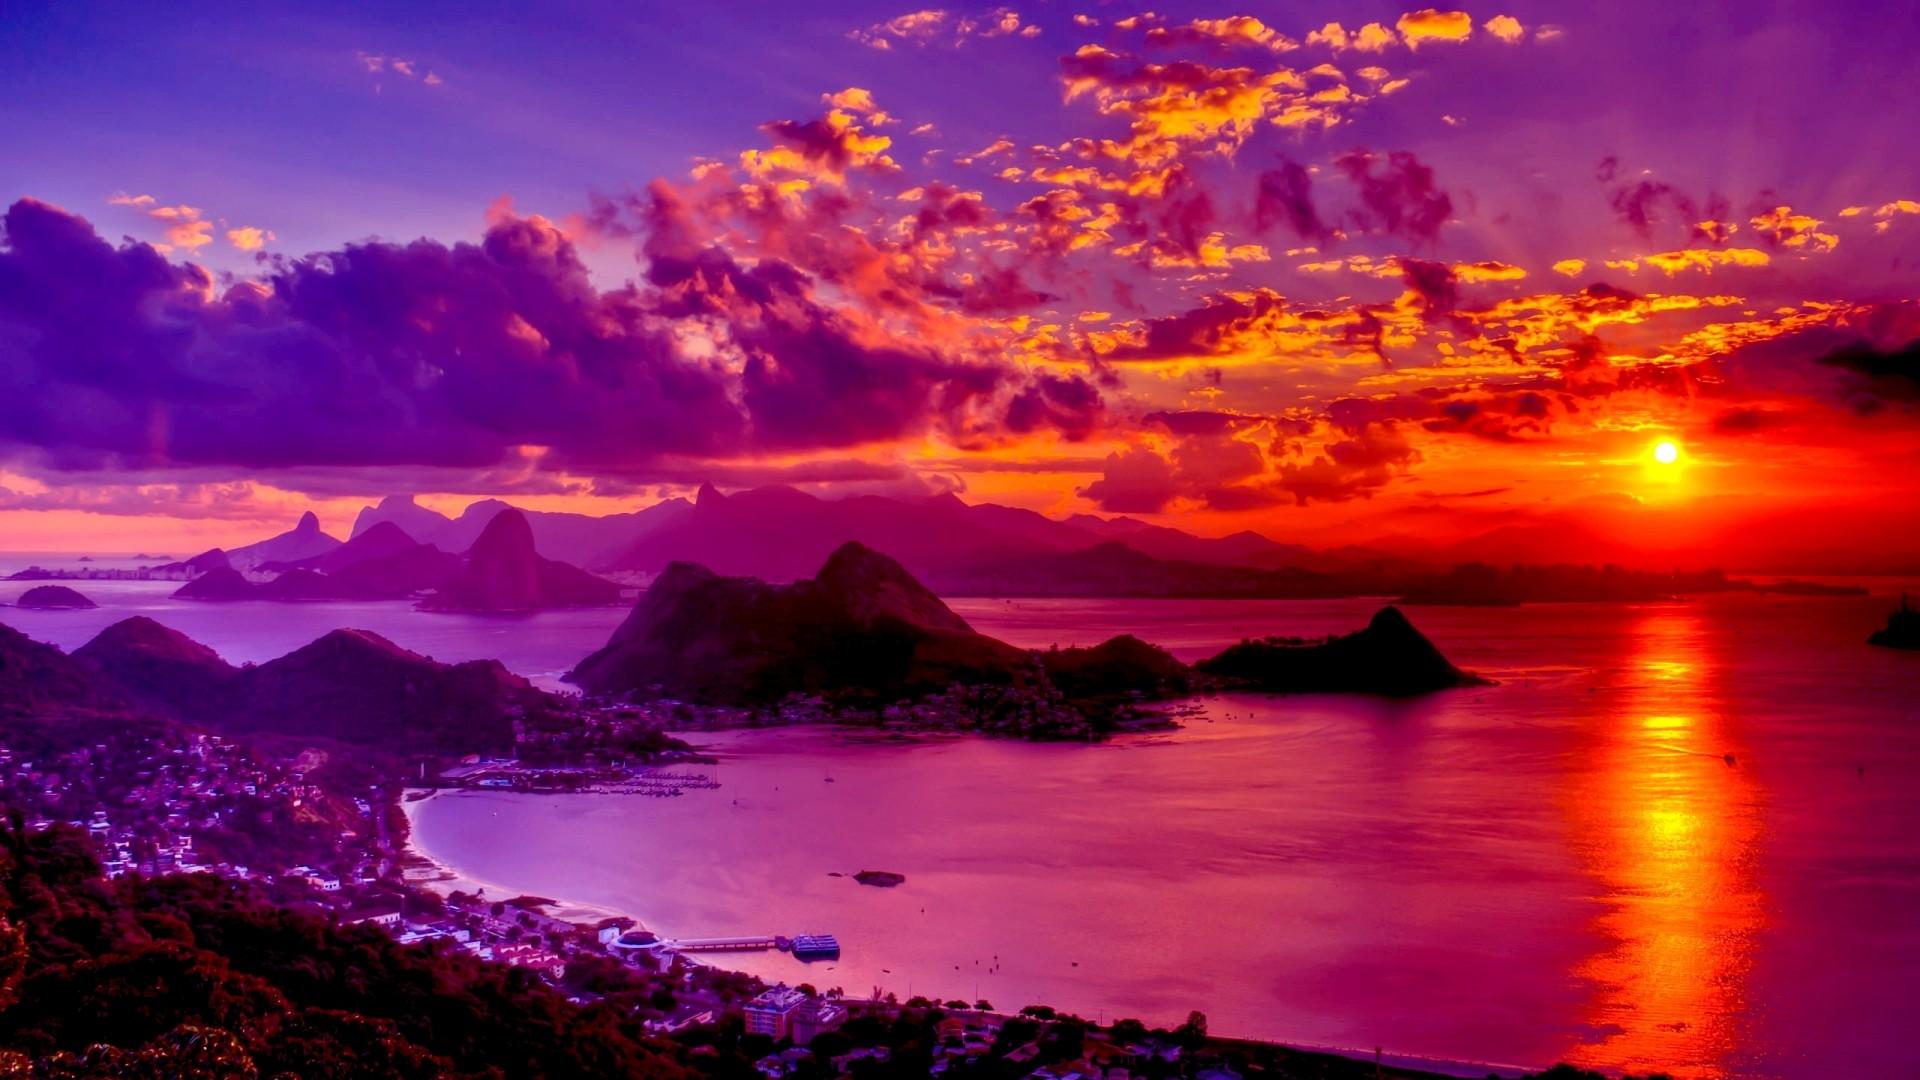 Fabulous Sunset Wide Wallpaper 550061 Wallpapers13com 1920x1080